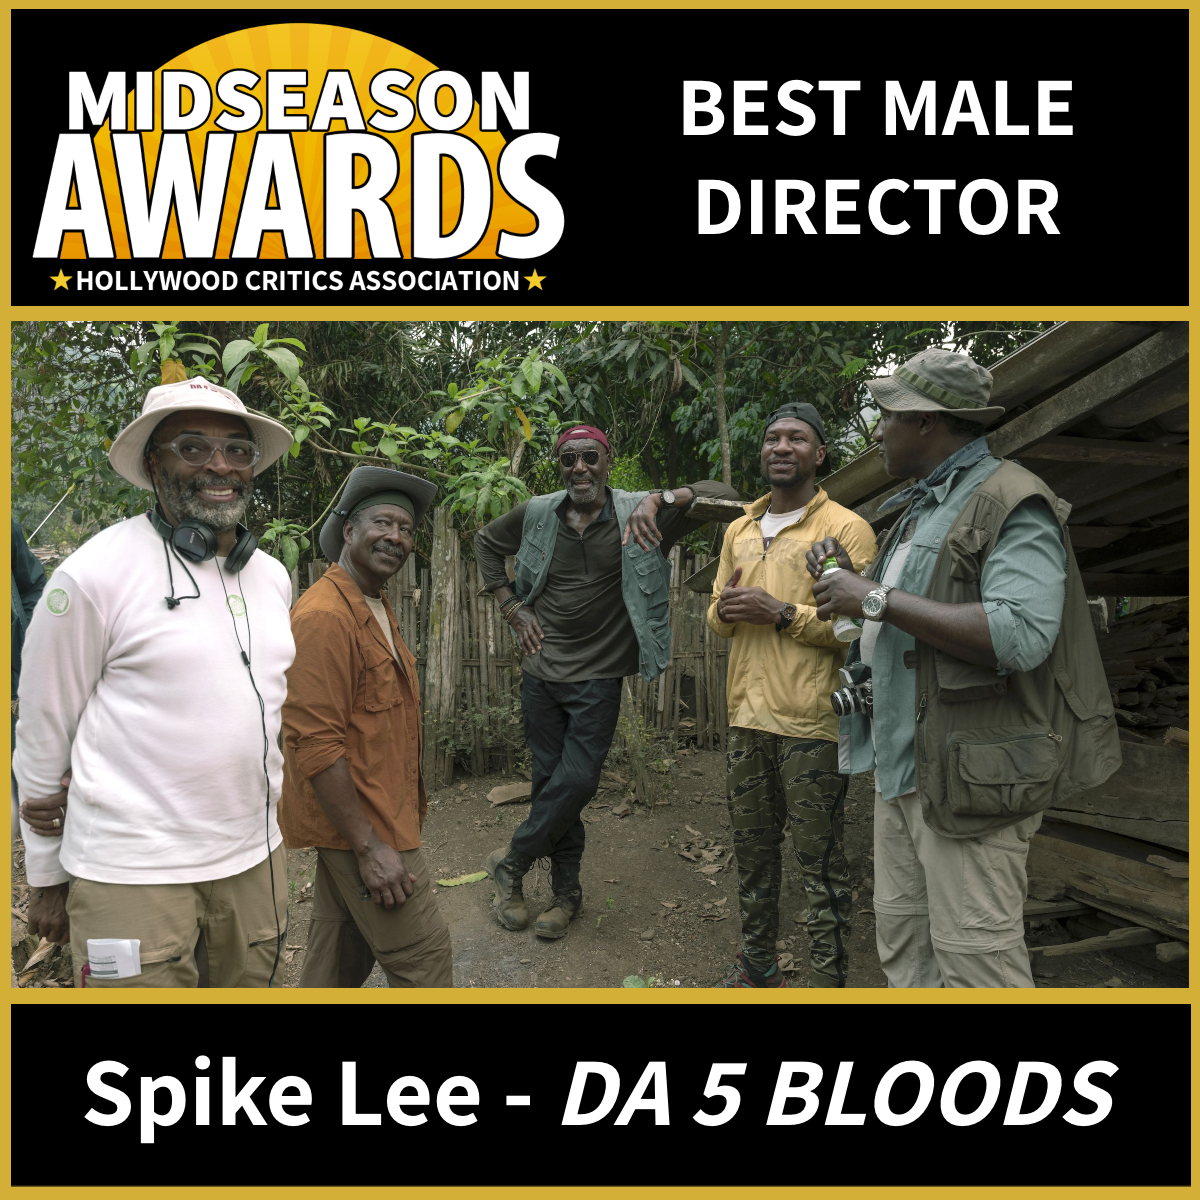 Best Male Director - Spike Lee for Da 5 Bloods